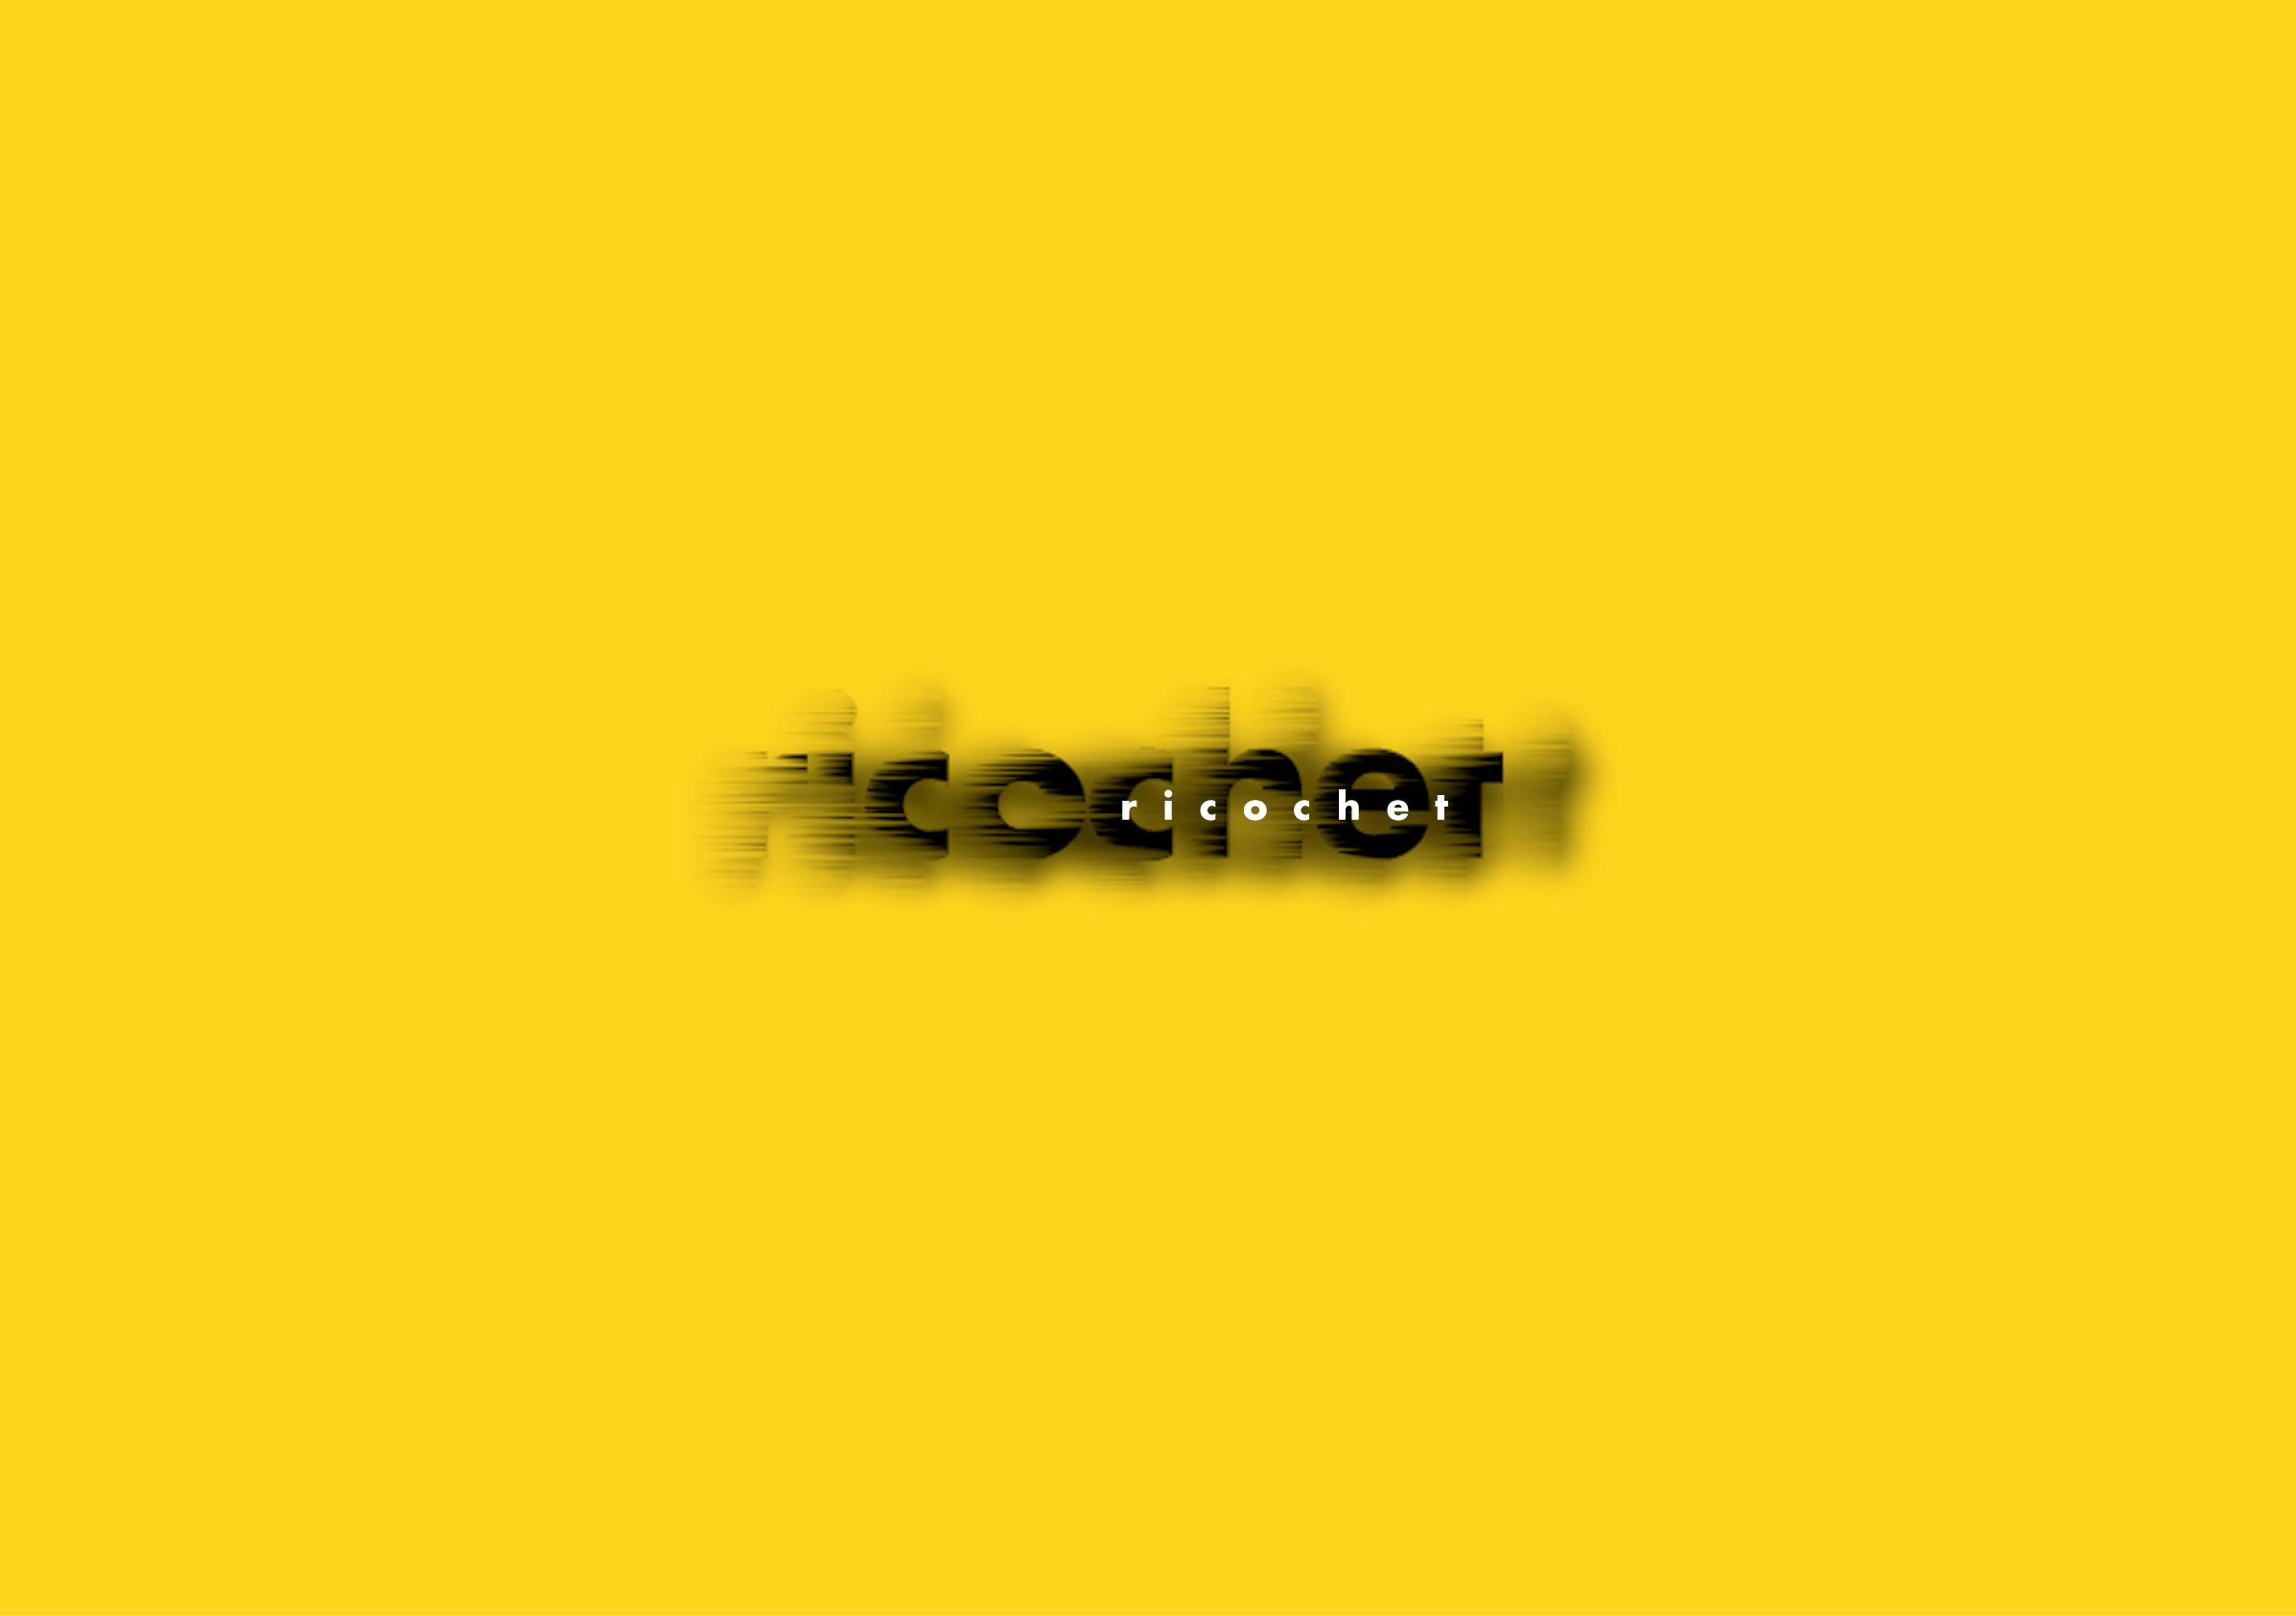 Ricochet Creative Thinking Logo Reversed by Ottawa Graphic Designer idApostle